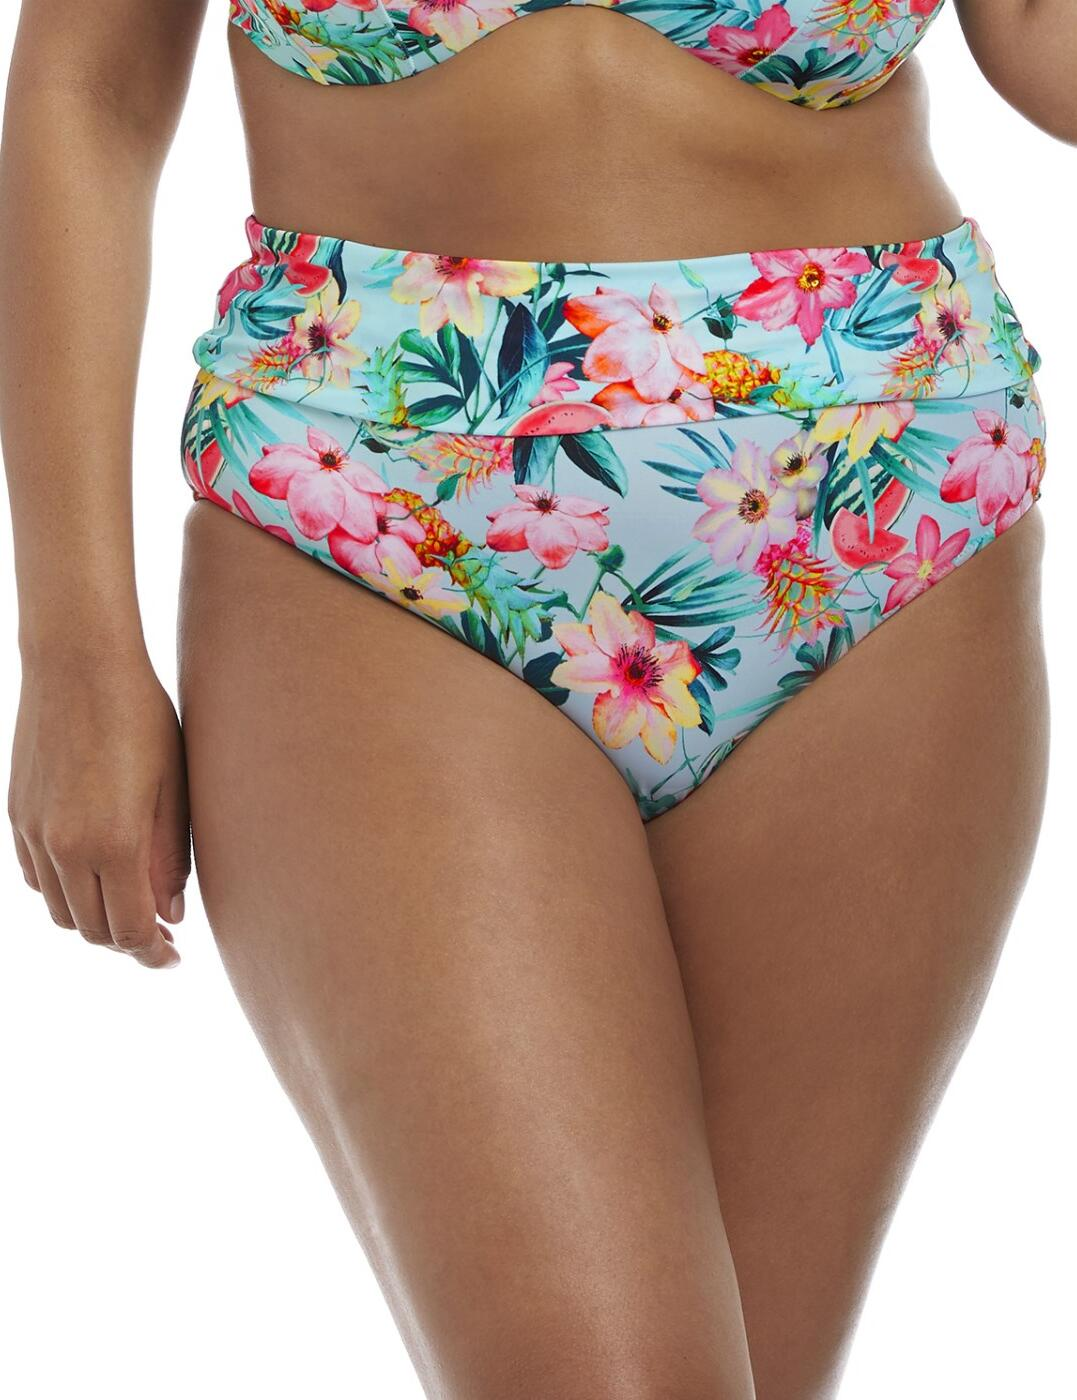 7154 Elomi Aloha Fold Bikini Brief - 7154 Aqua